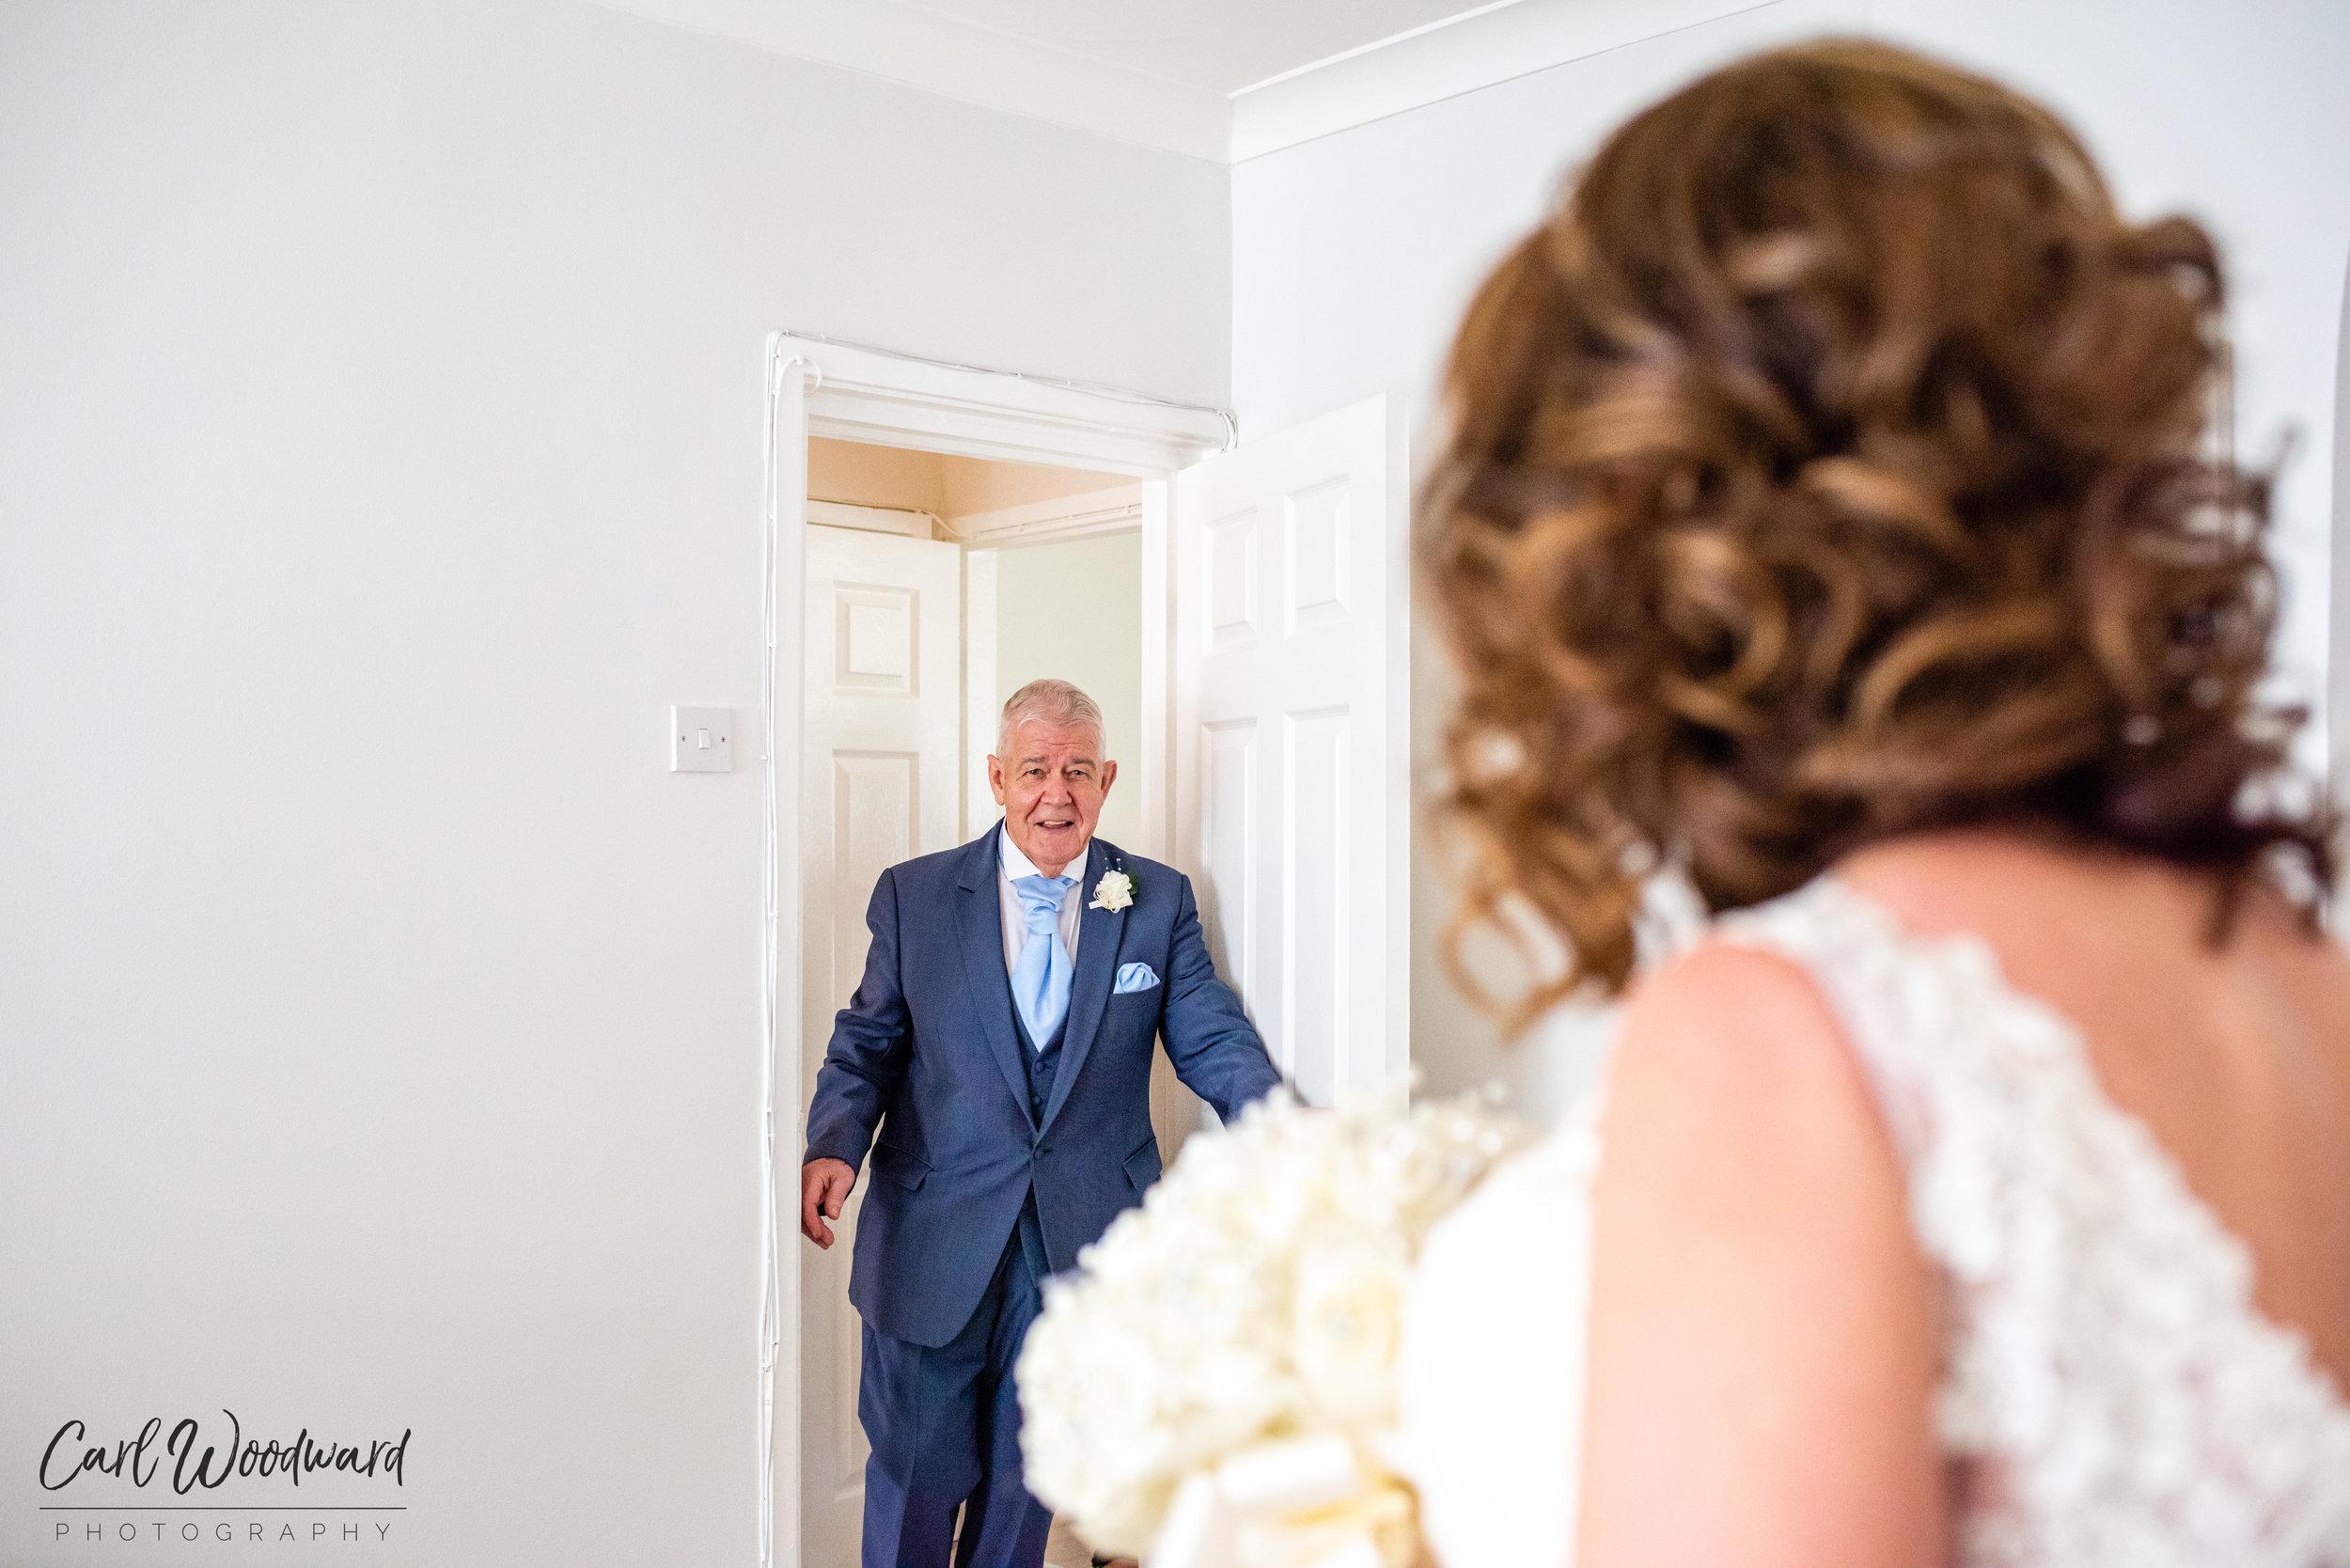 008-Mountain-Ash-Golf-Club-Wedding-Photography-Cardiff-Wedding-Photographer.jpg